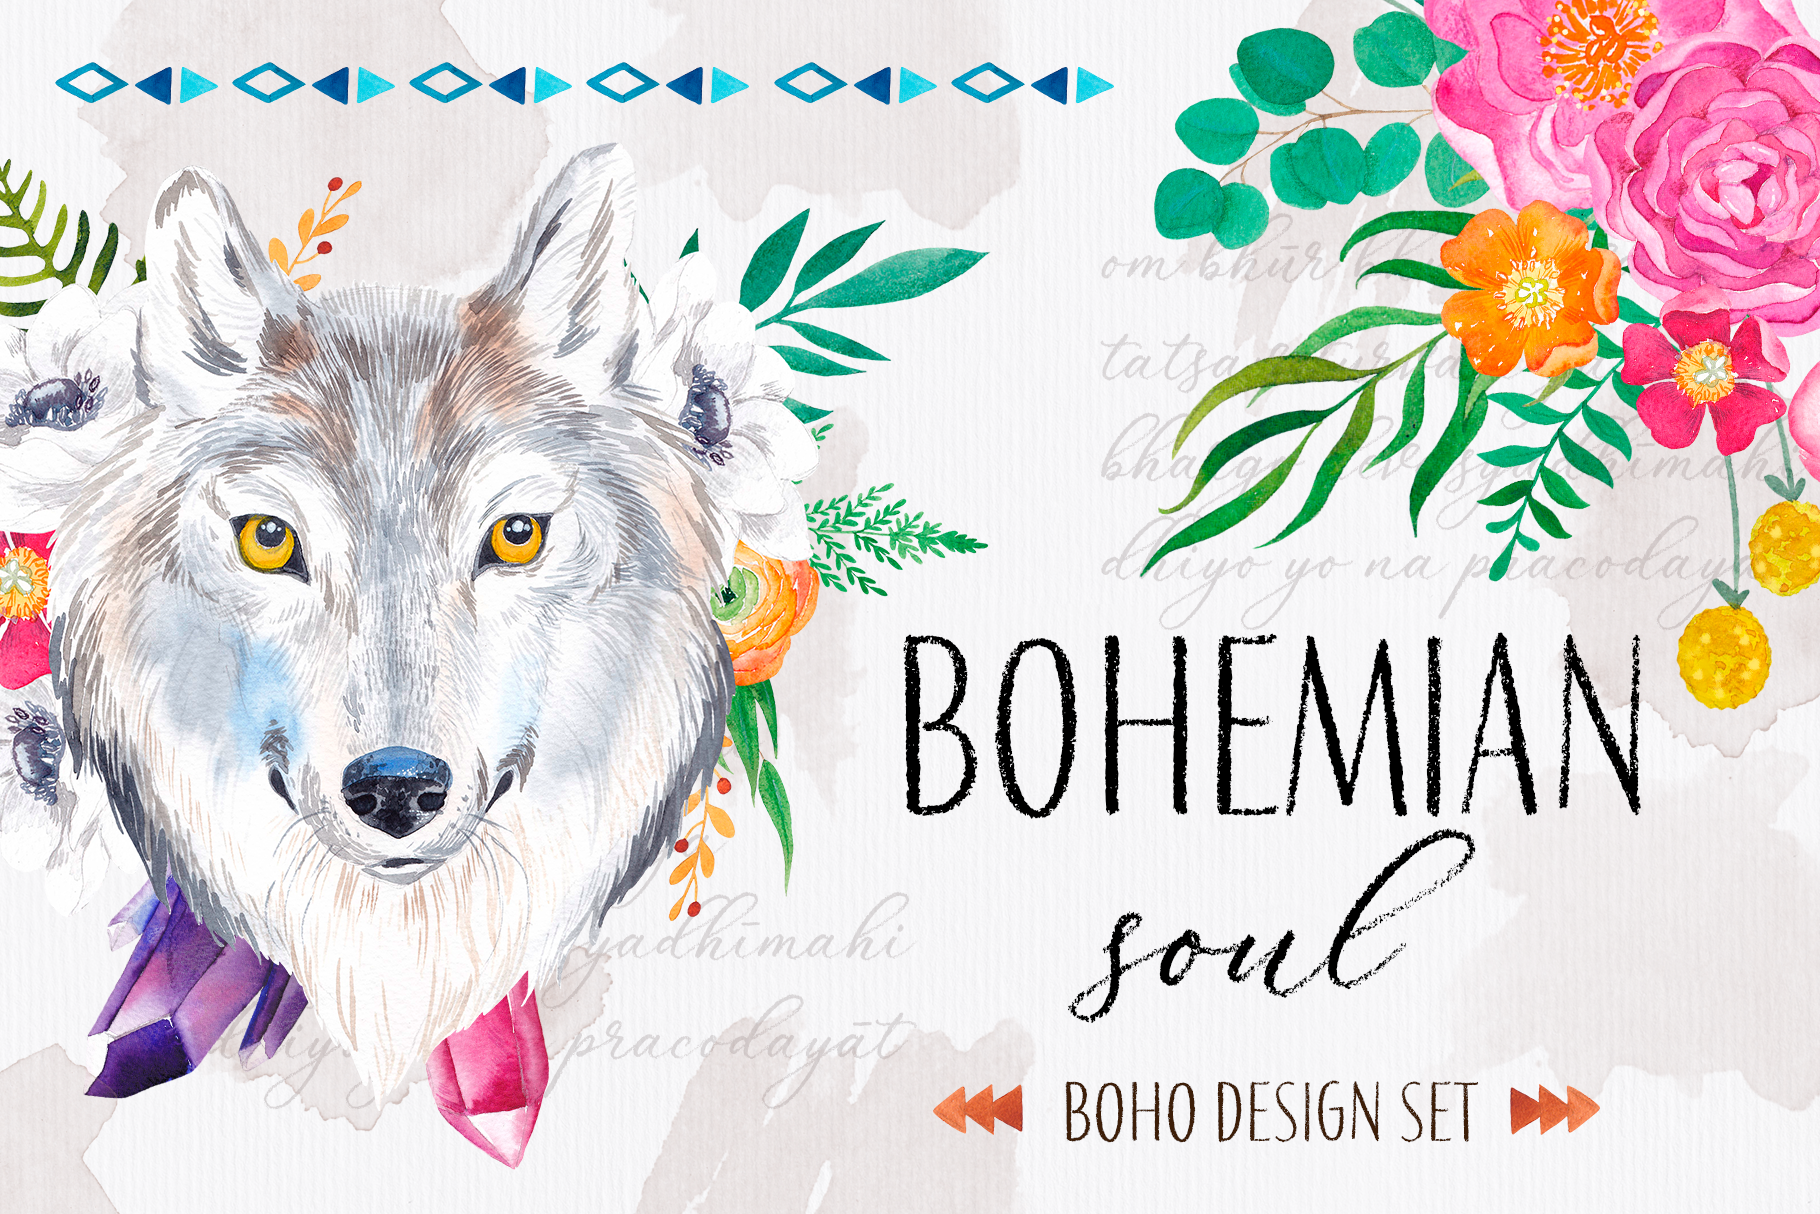 Bohemian soul - boho design set example image 1